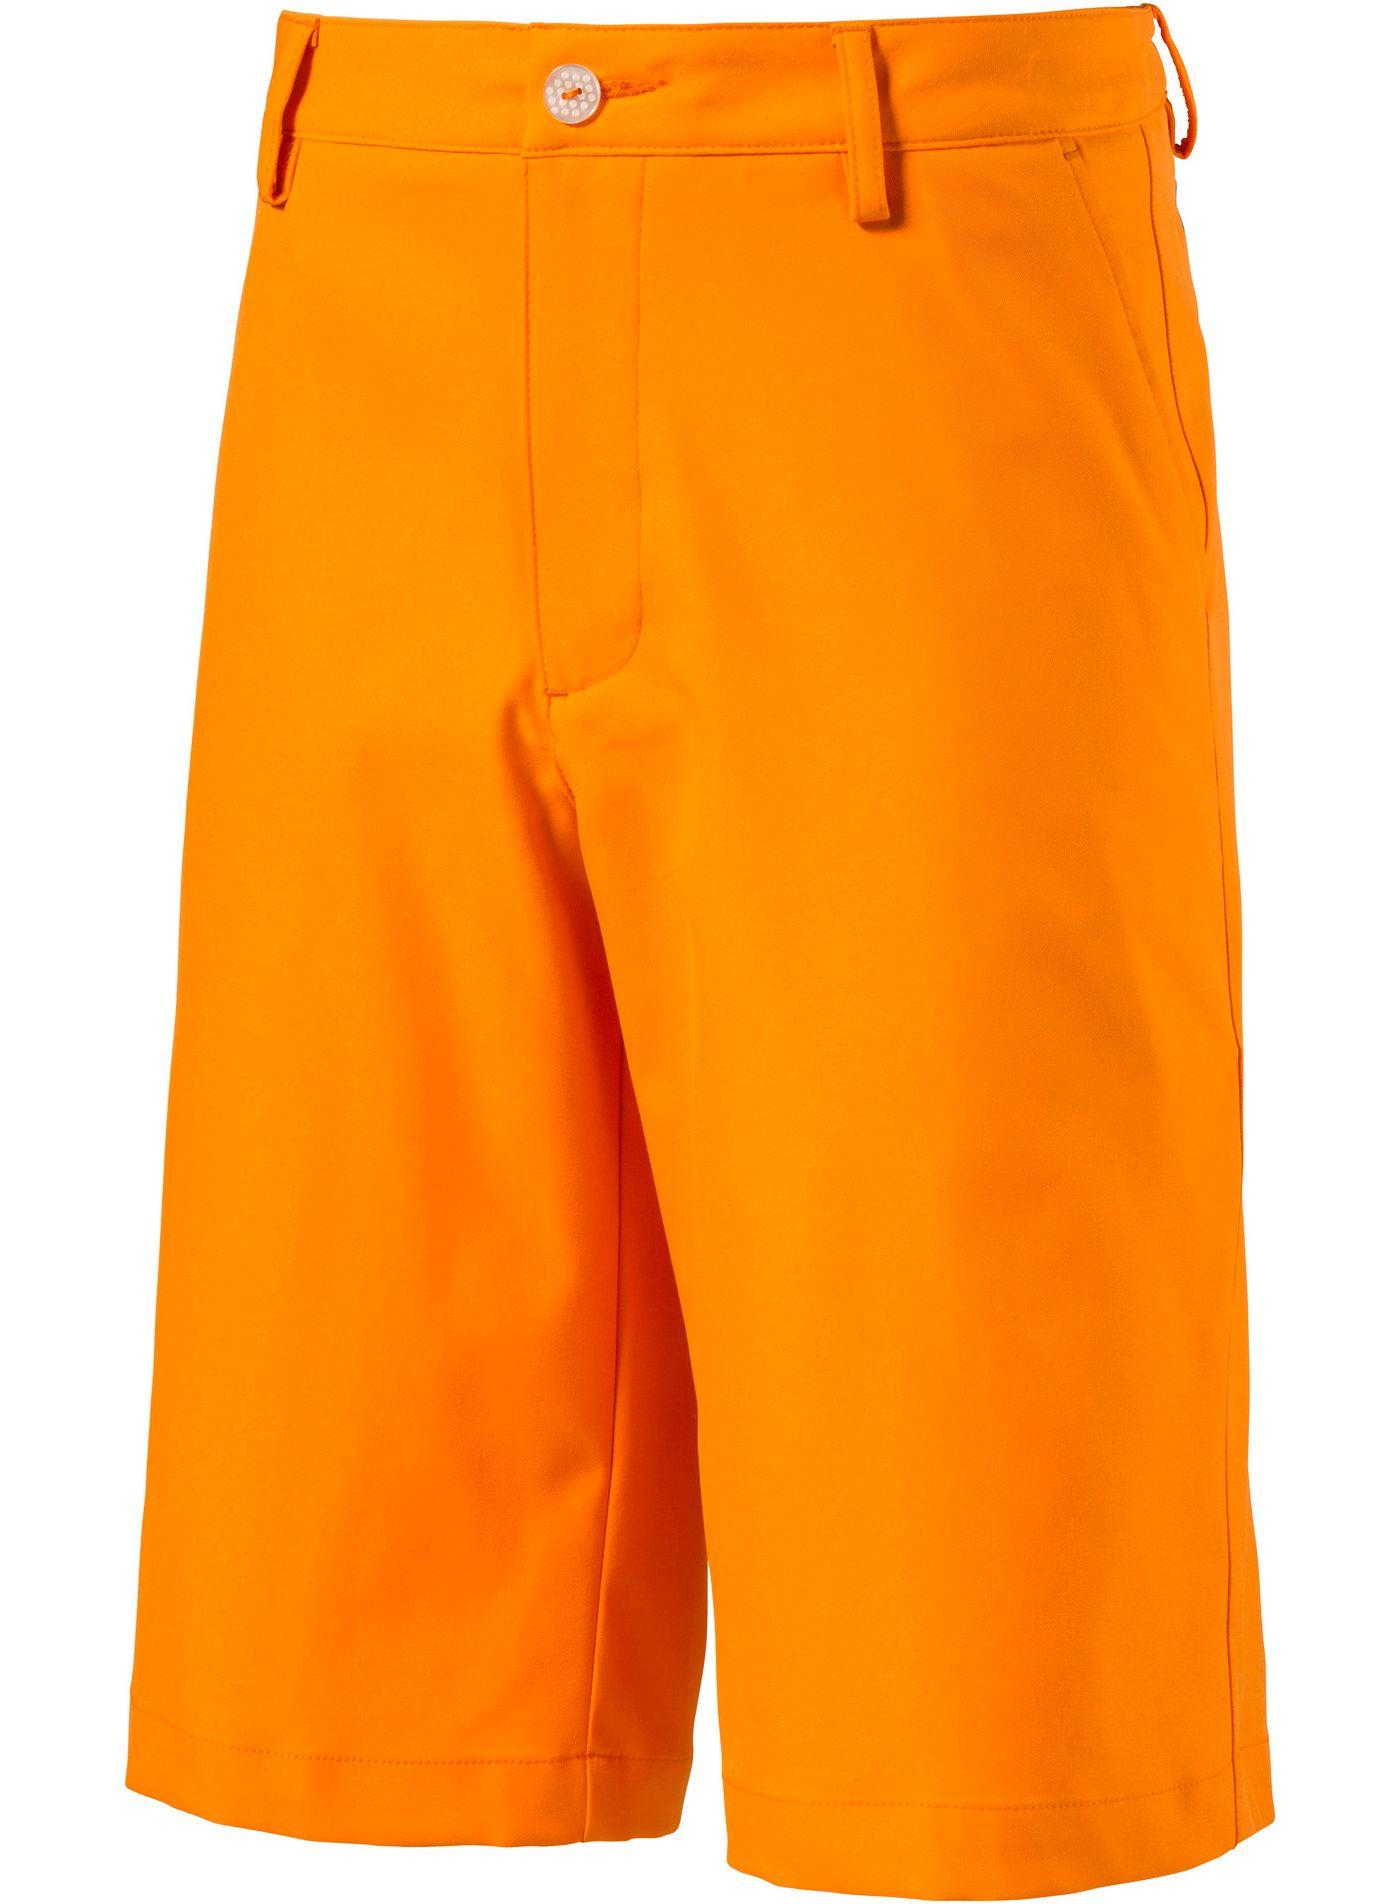 PUMA Boys' Pounce Golf Shorts